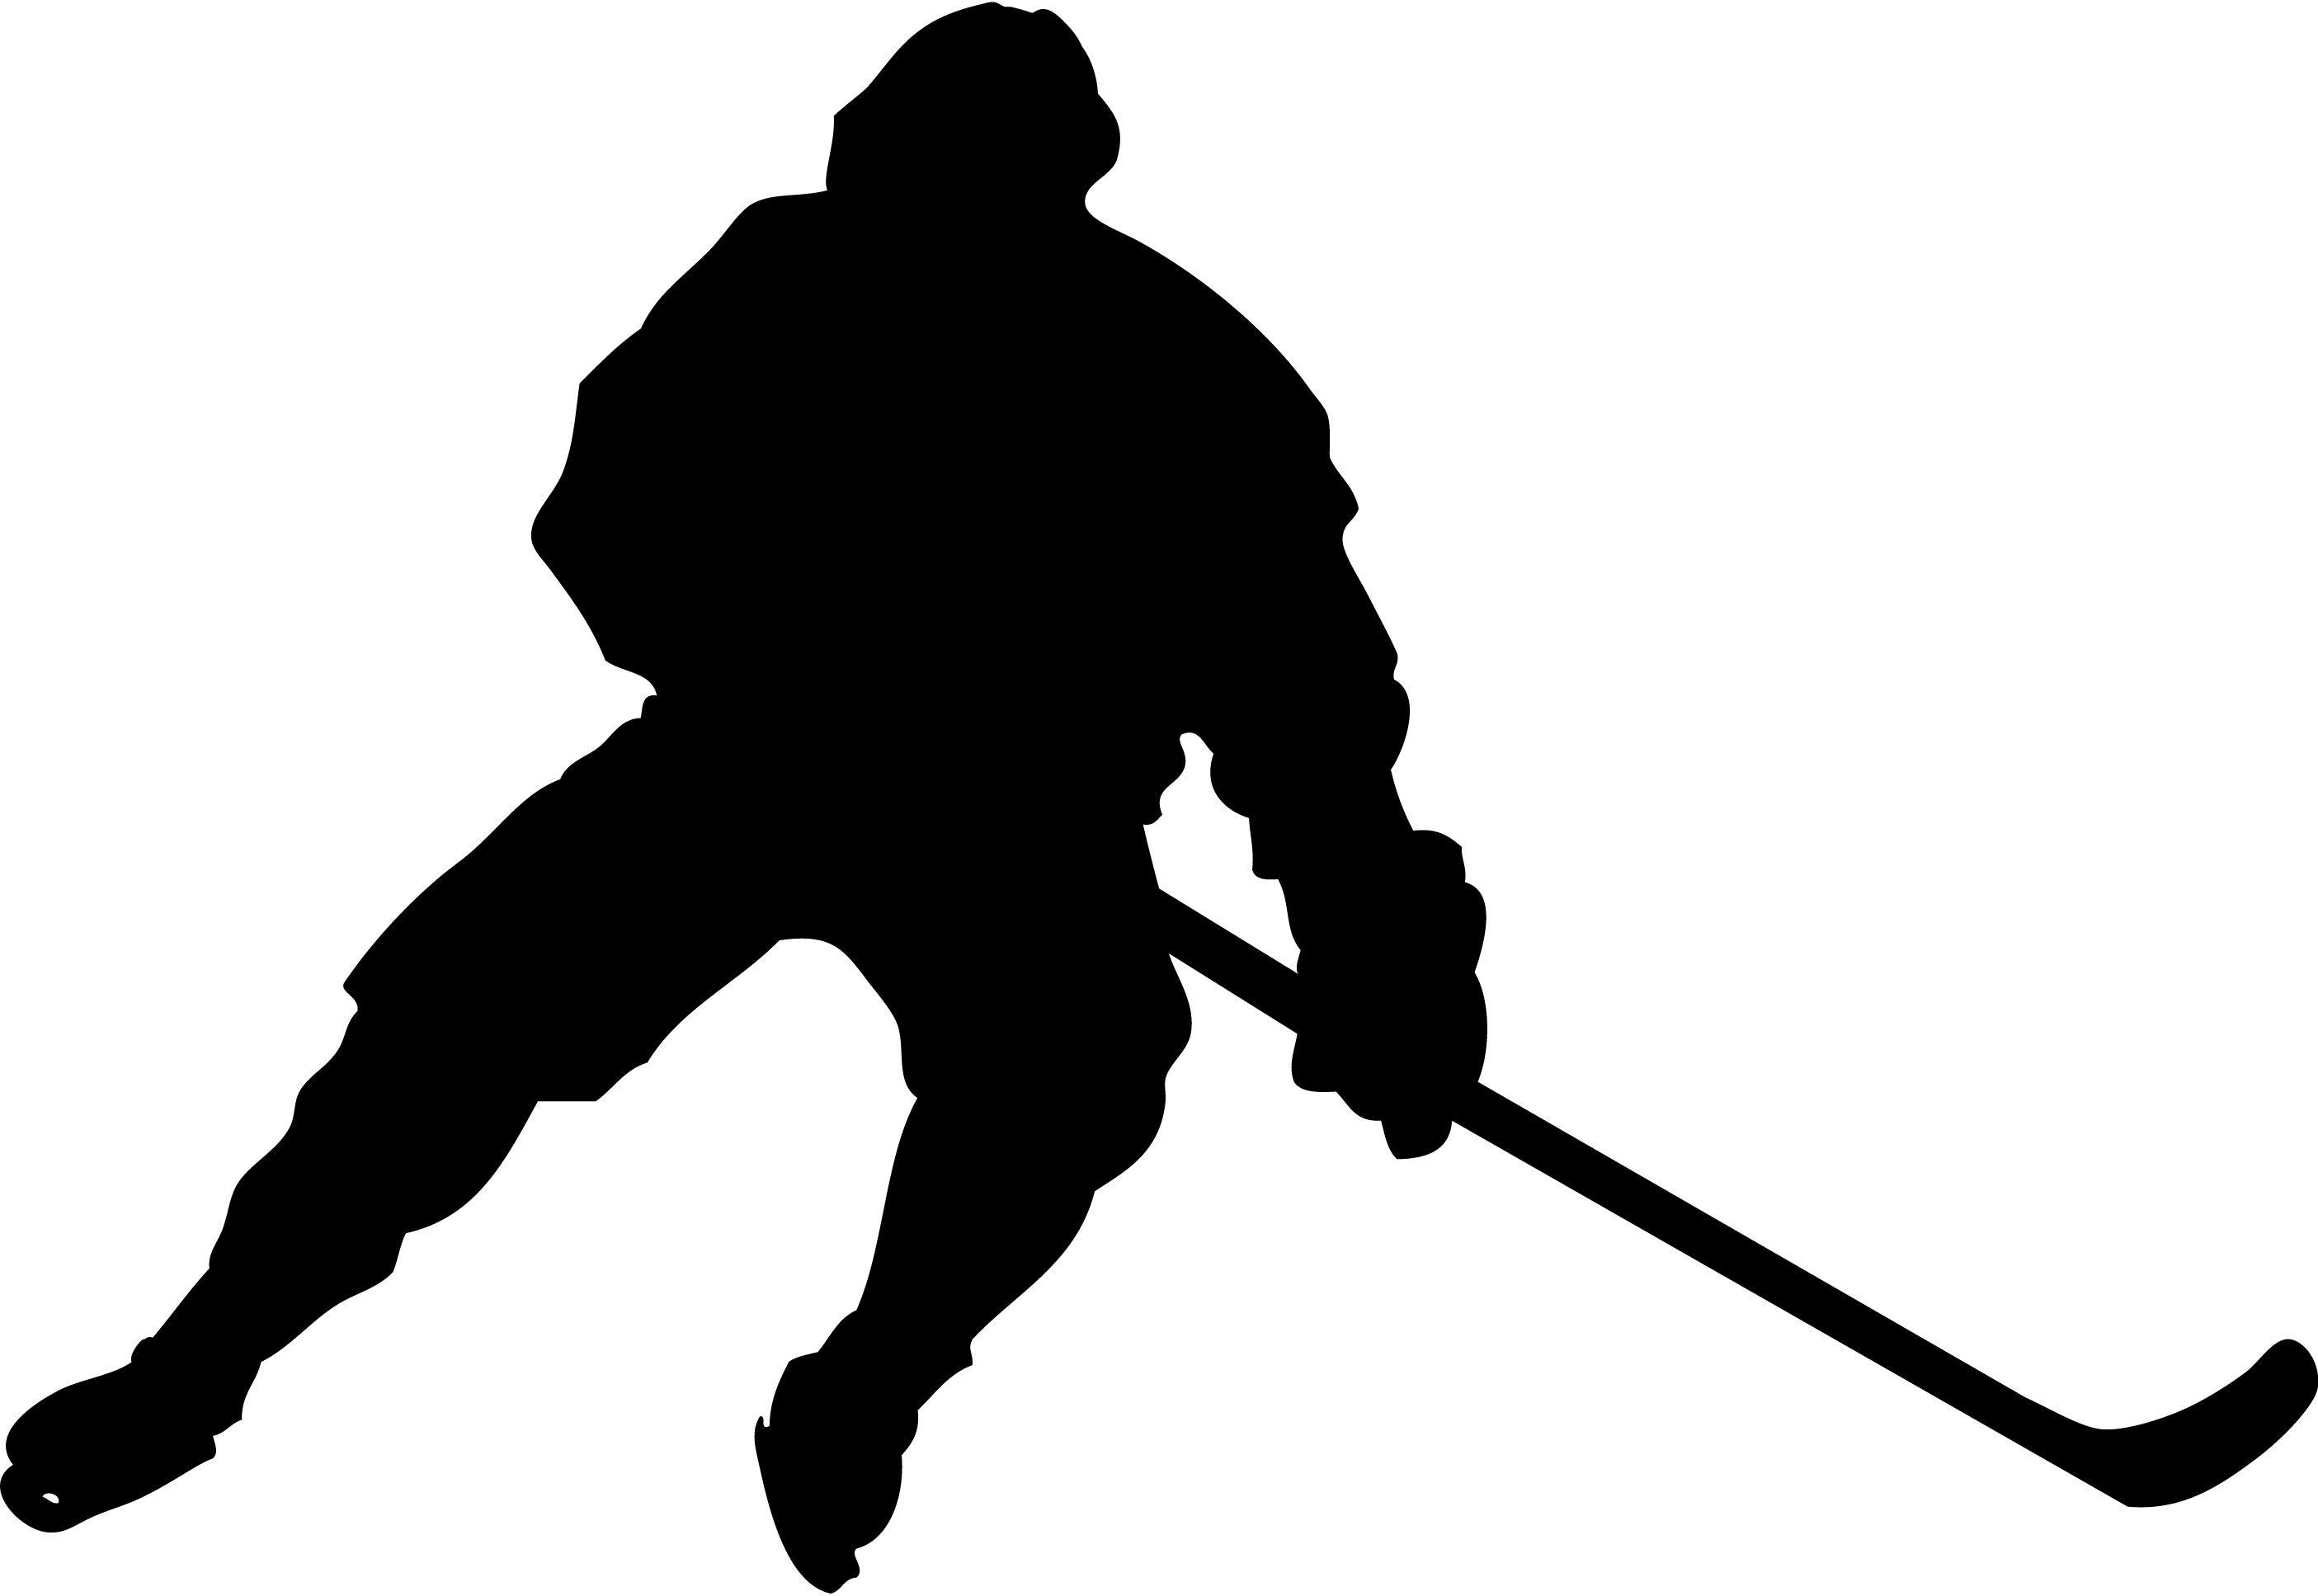 2810x1935 Silhouette Of A Hockey Goalie Making A Glove Save. Description